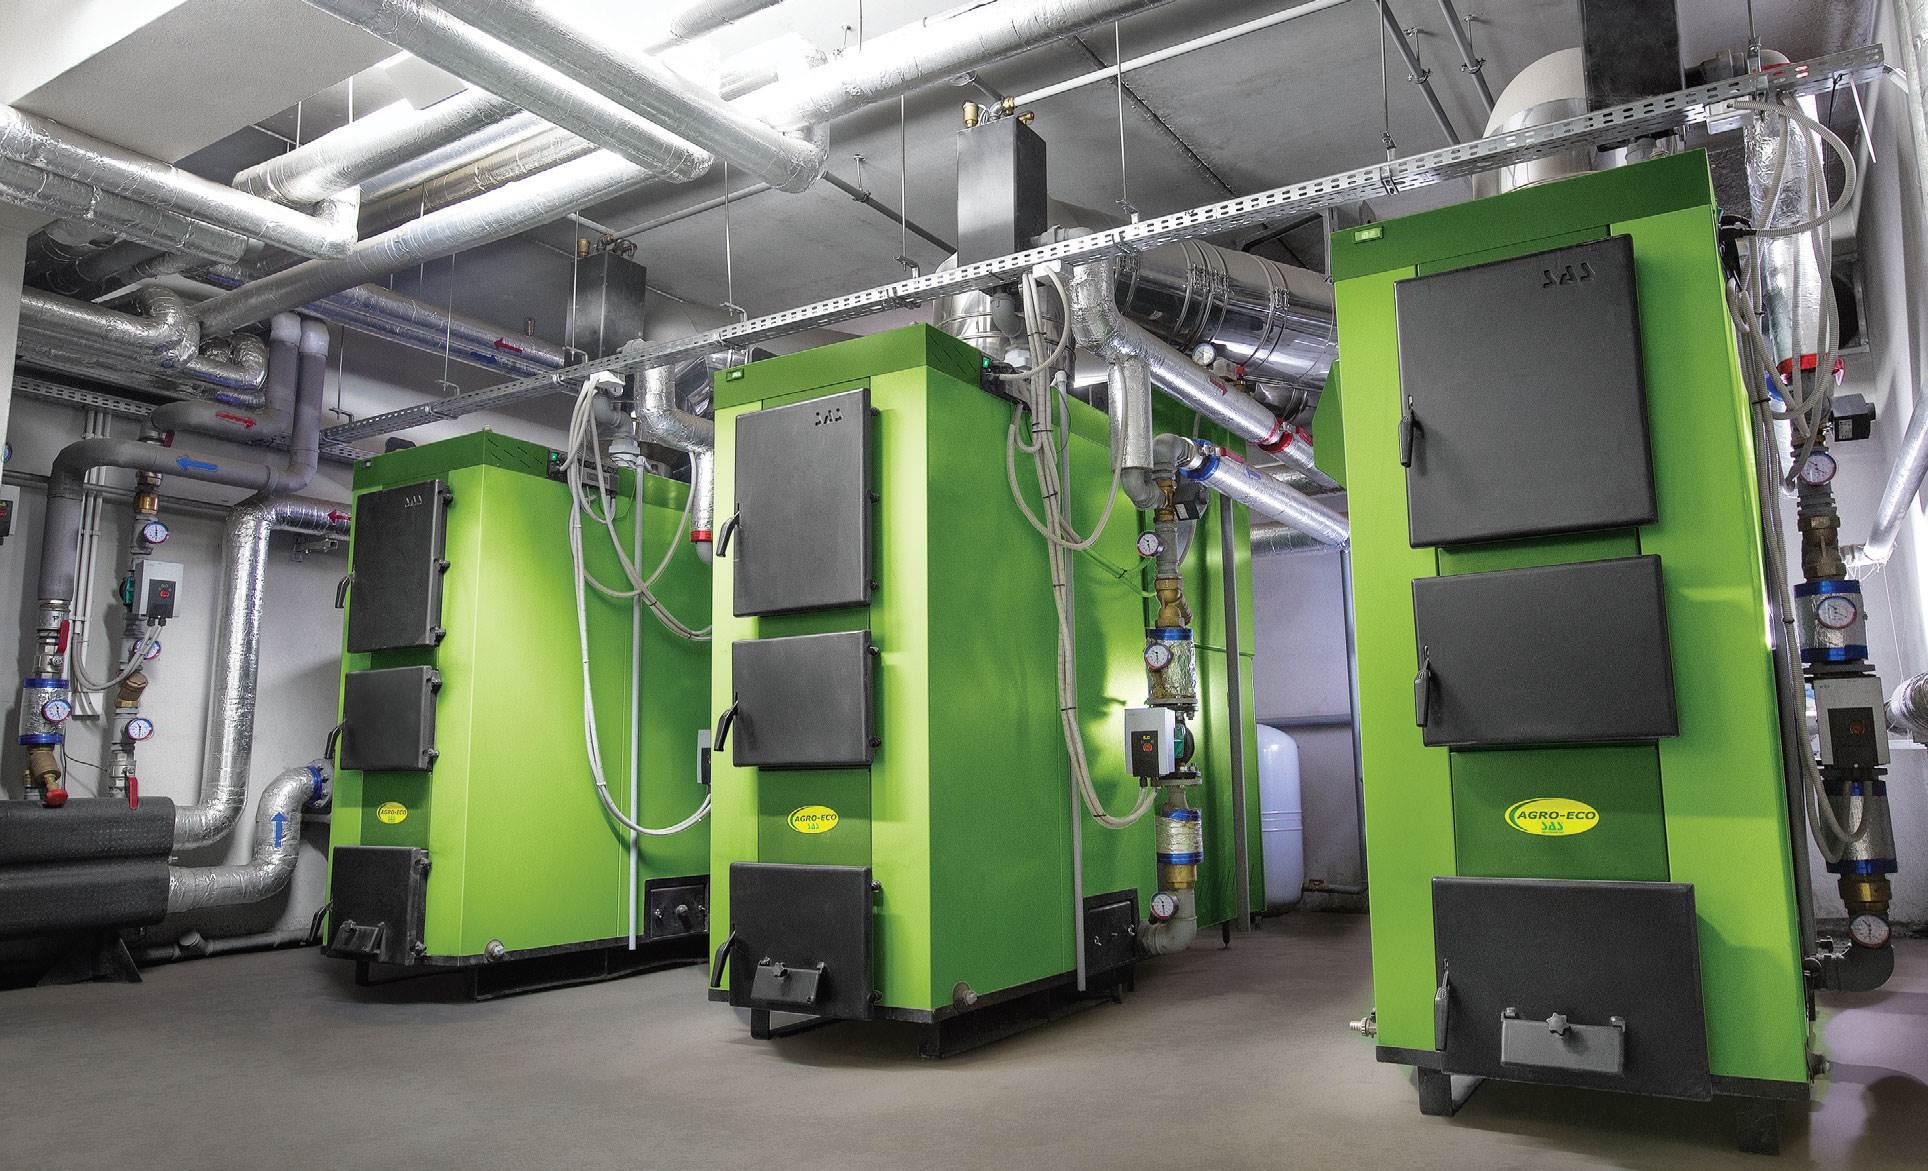 nowoczesne kotly na paliwa stale niska emisyjnosc i zuzycie energii - Nowoczesne kotły na paliwa stałe: niska emisyjność i zużycie energii